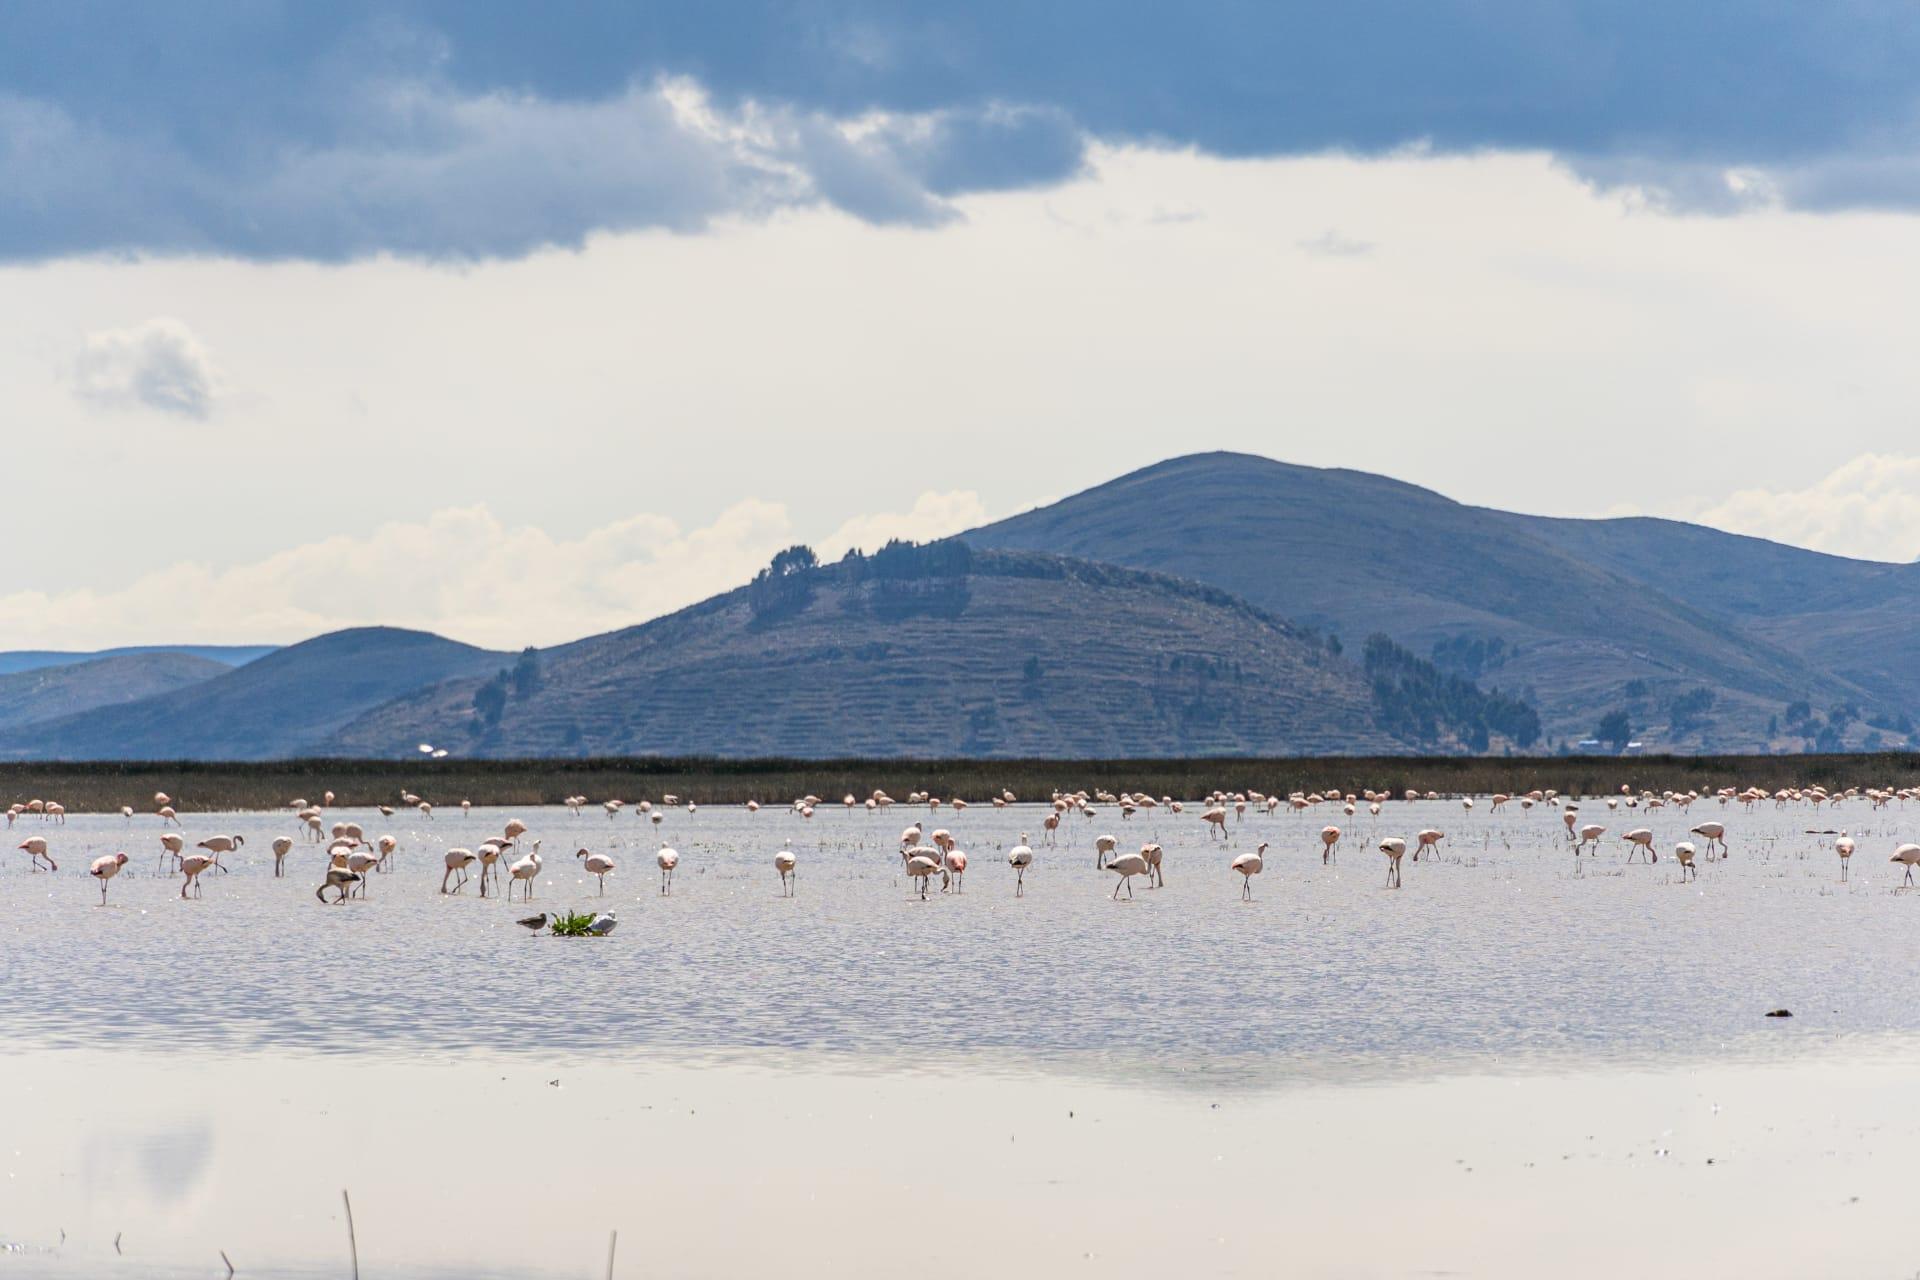 La Paz - Humamarka, a Bird's Eye Viewpoint on Lake Titicaca